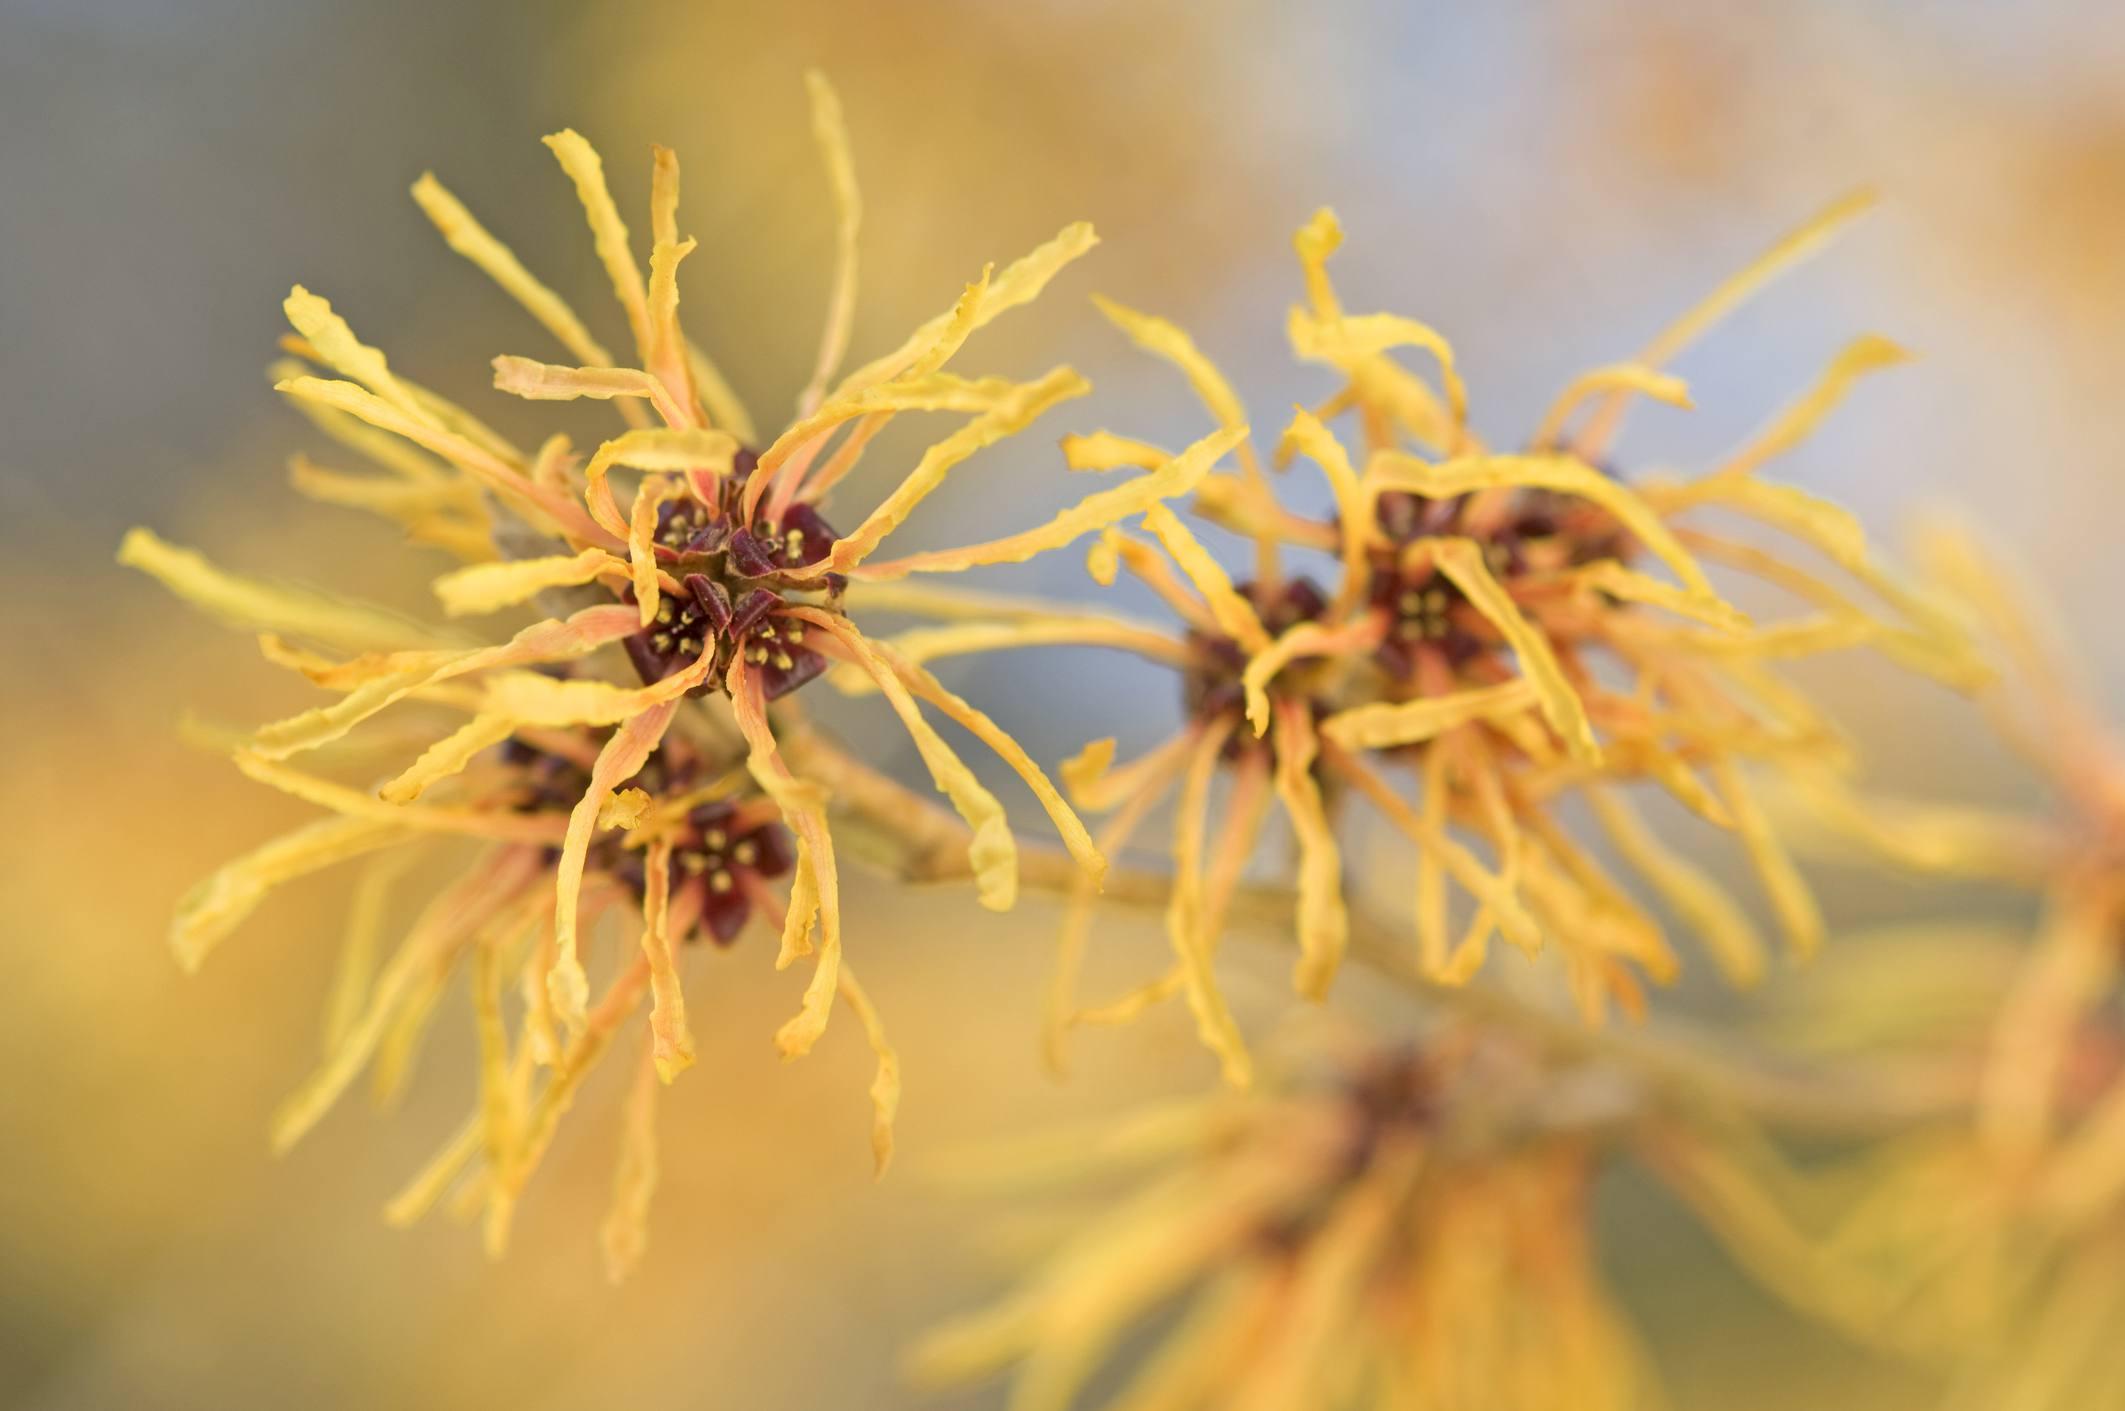 Witch hazel (Hamamelis x intermedia 'Aurora') flowers in yellow and orange.